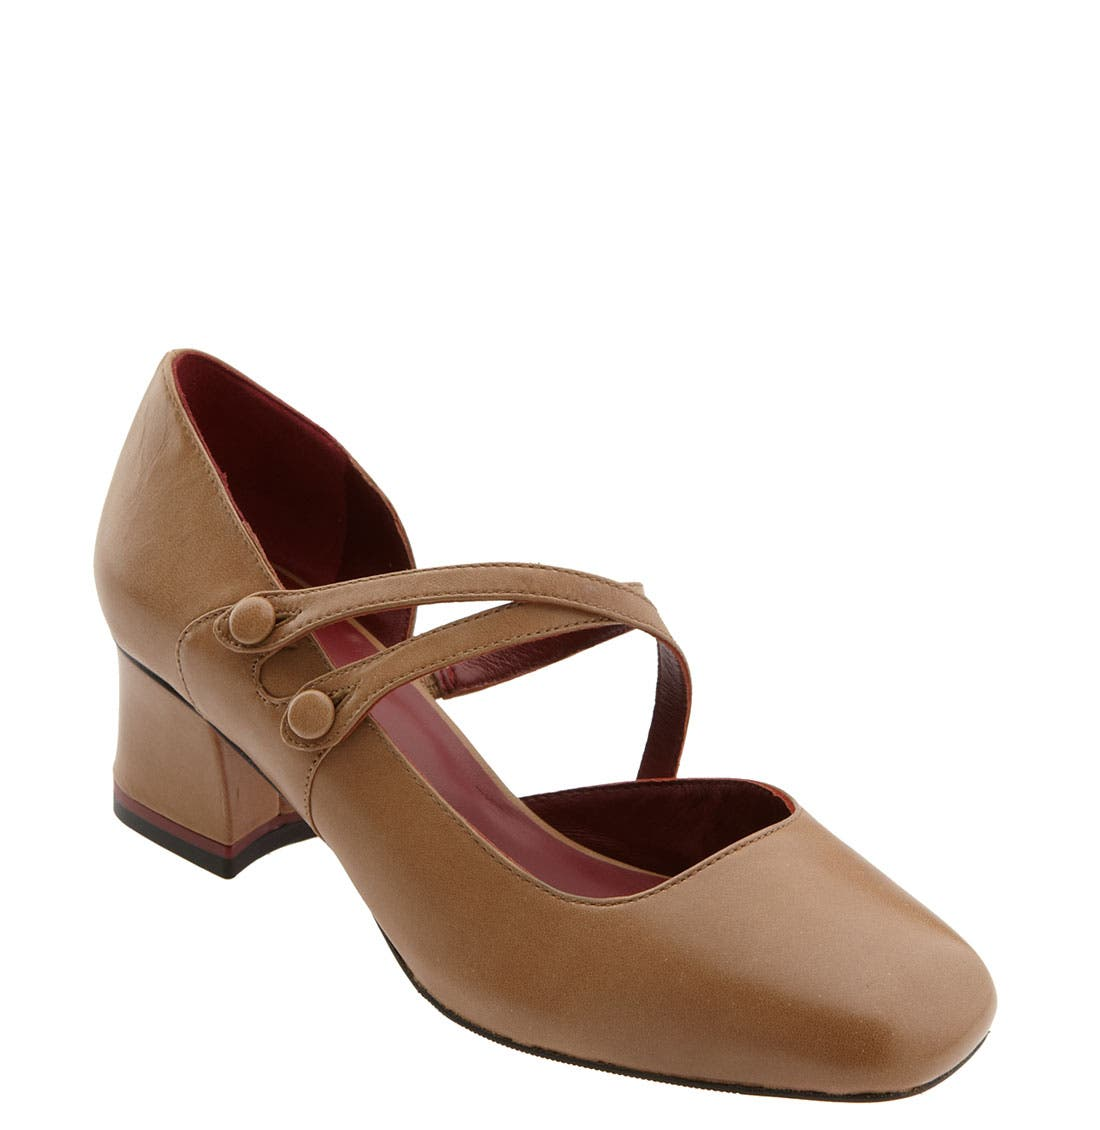 Alternate Image 1 Selected - Oh! Shoes 'Melany' Mary Jane